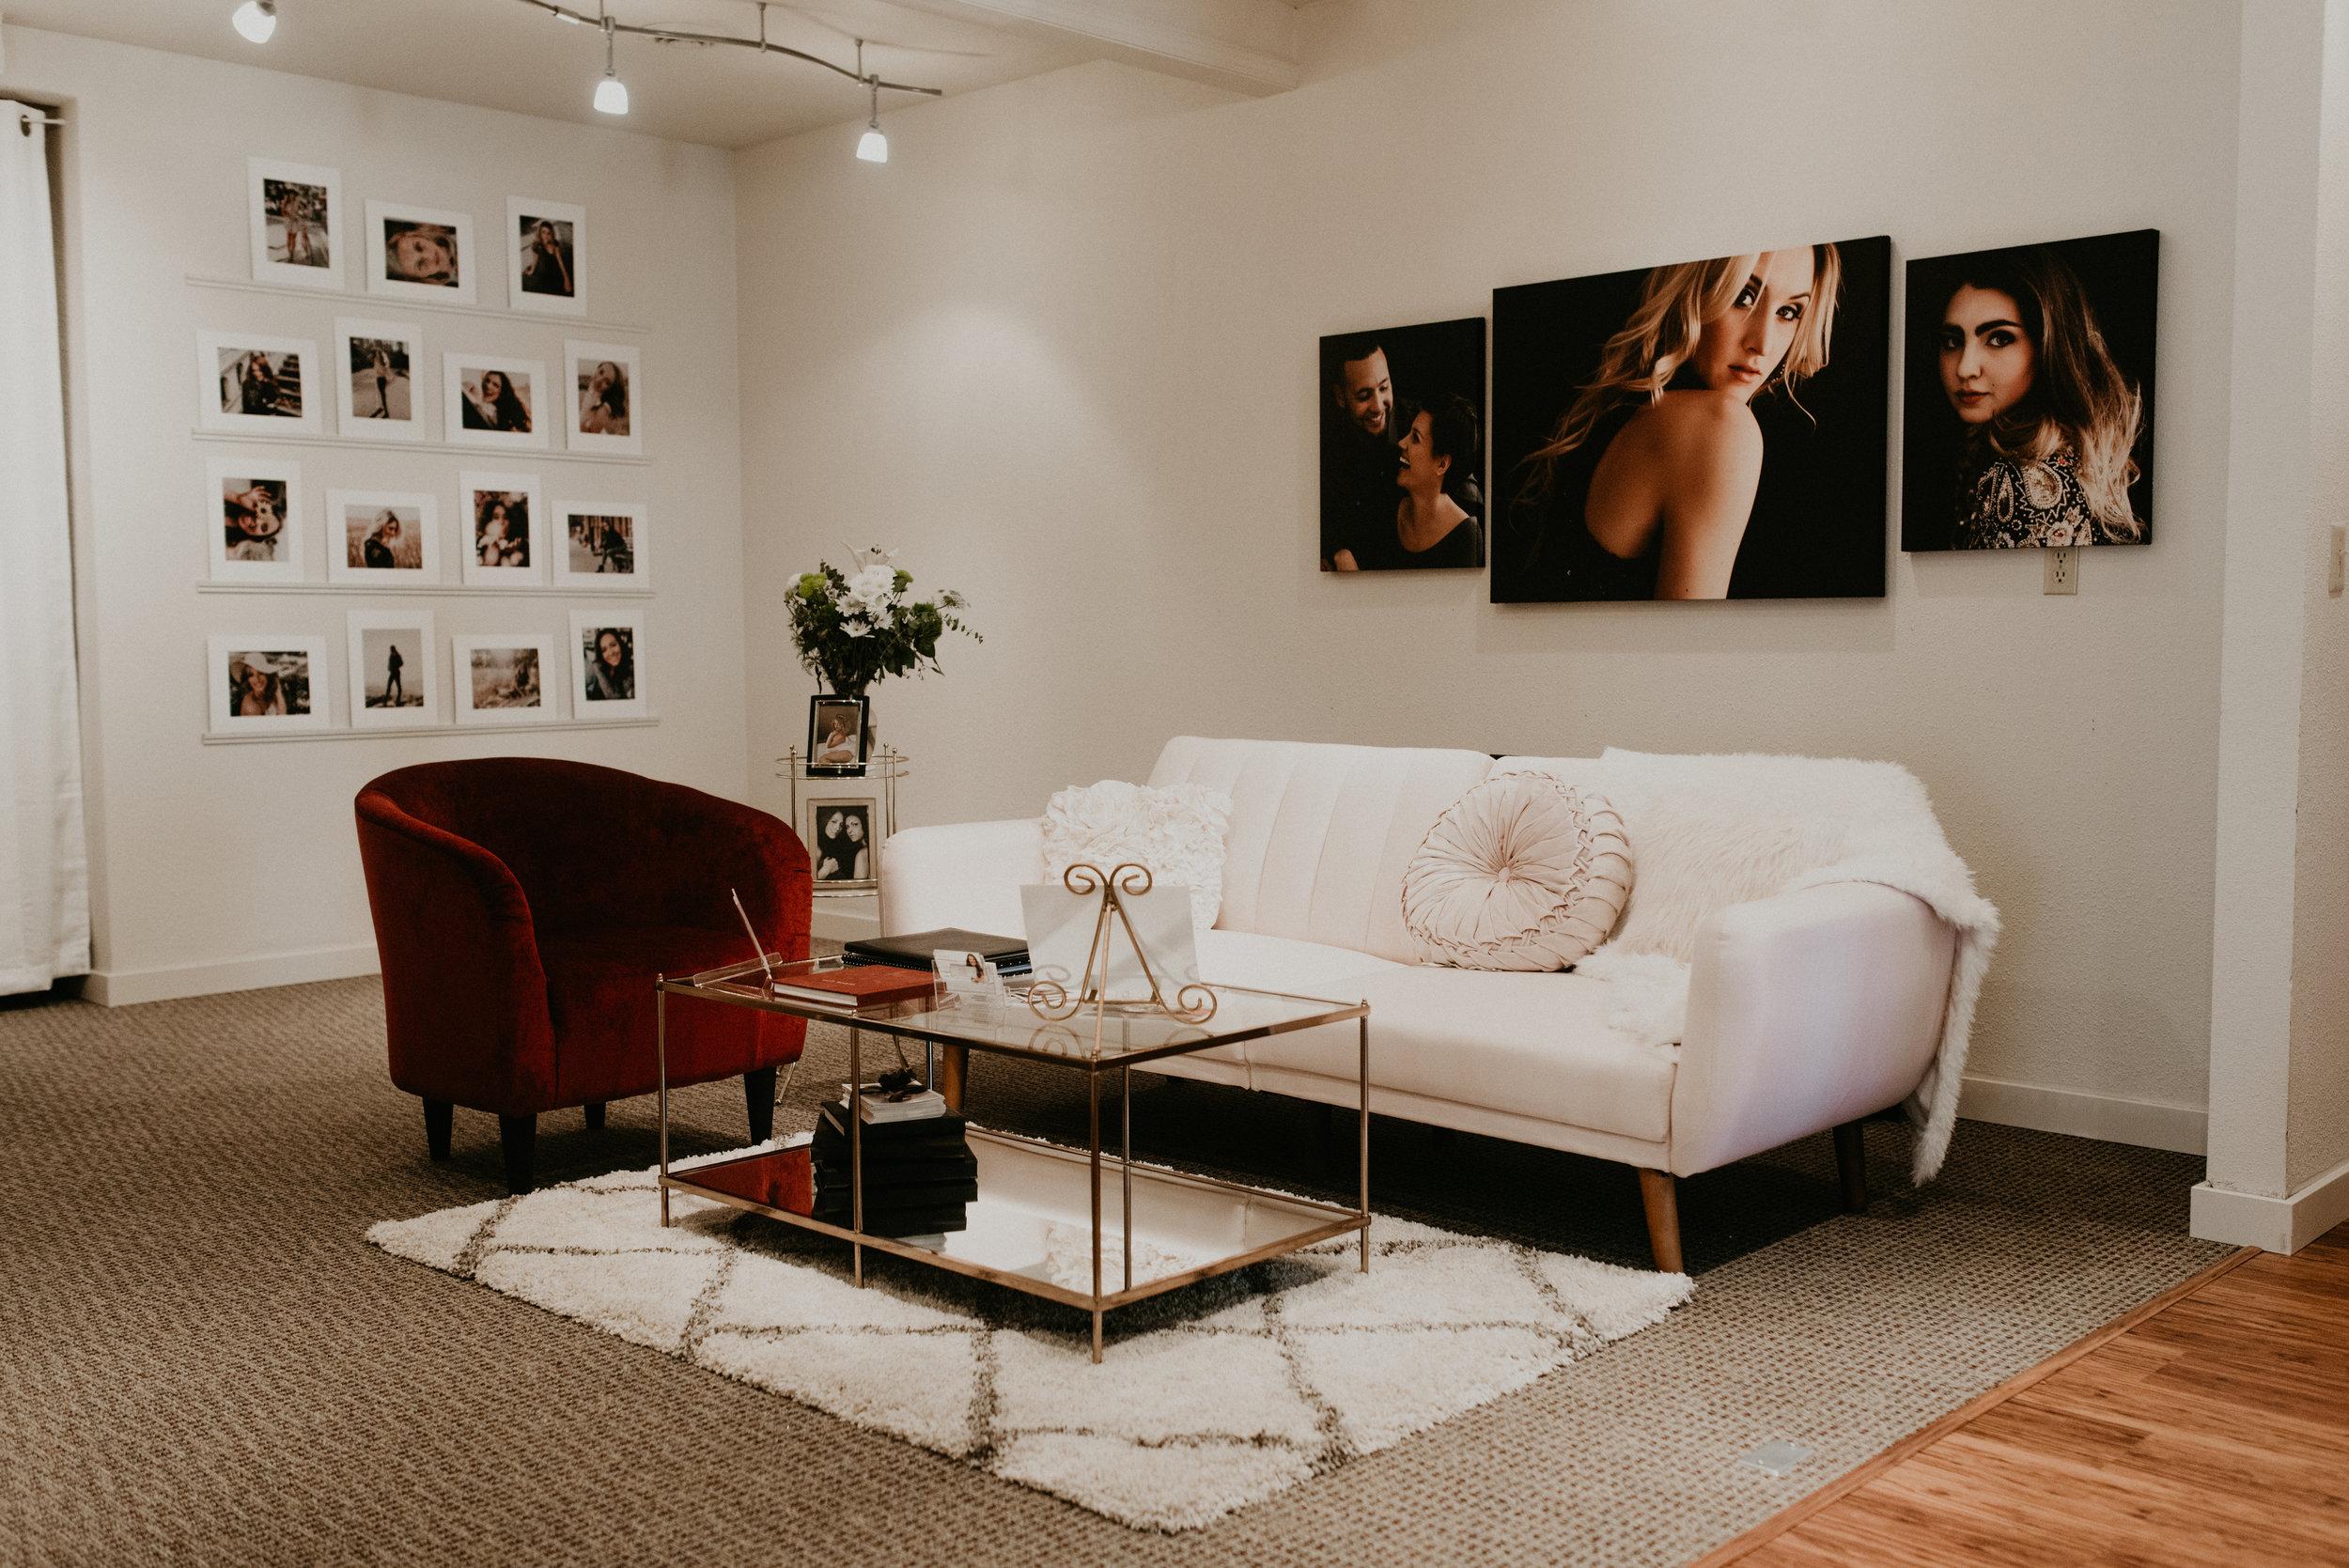 Boudoir by Kayla Boise Boudoir Photographer Makayla Madden Photography Luxury Portrait Experience Studio 870 Boise Reveal Room